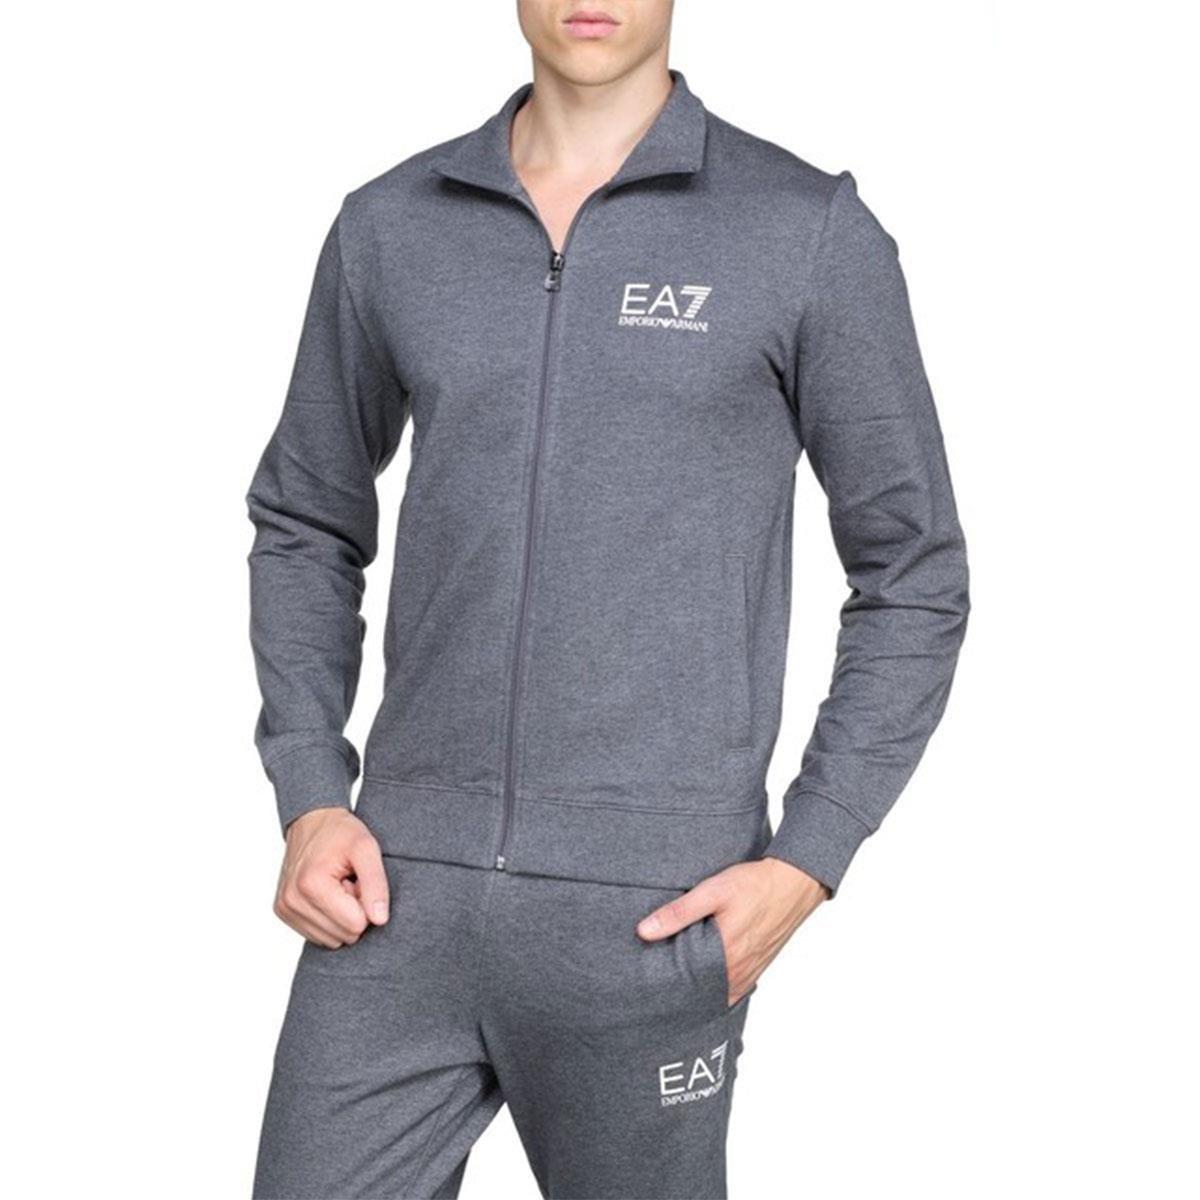 Emporio Armani EA7 EA7 Men's Full Zip Cotton Tracksuit